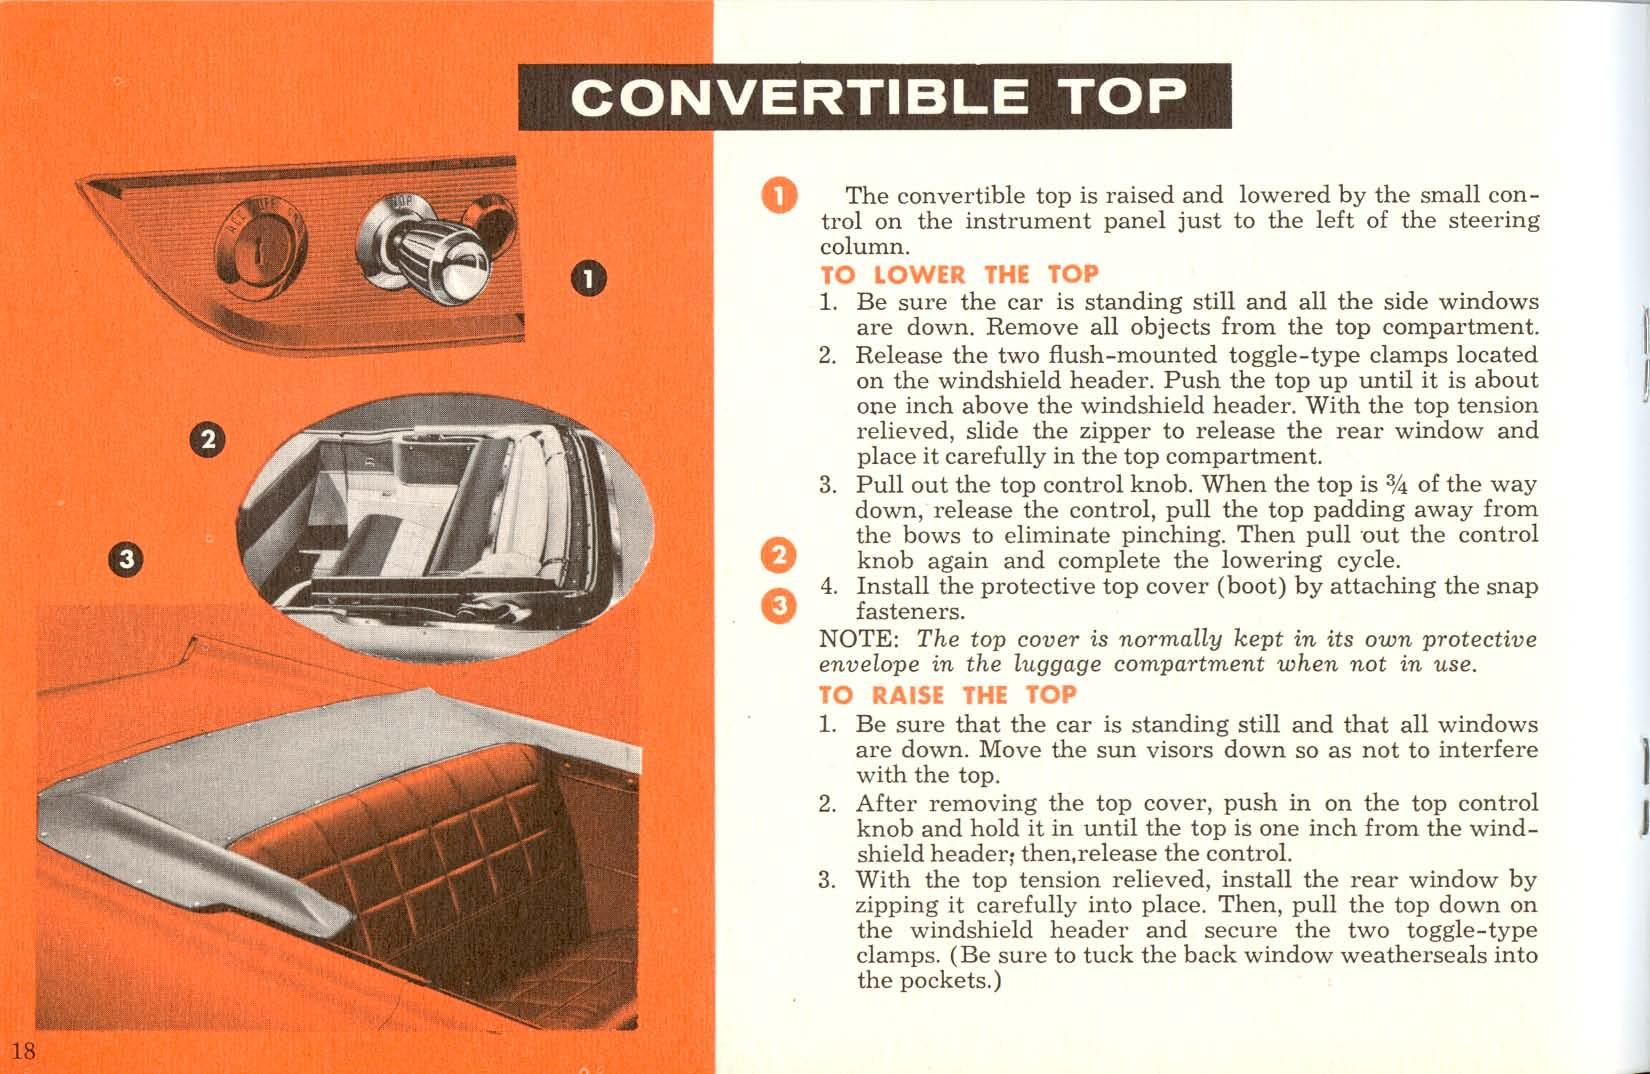 2003 porsche boxster owners manual pdf